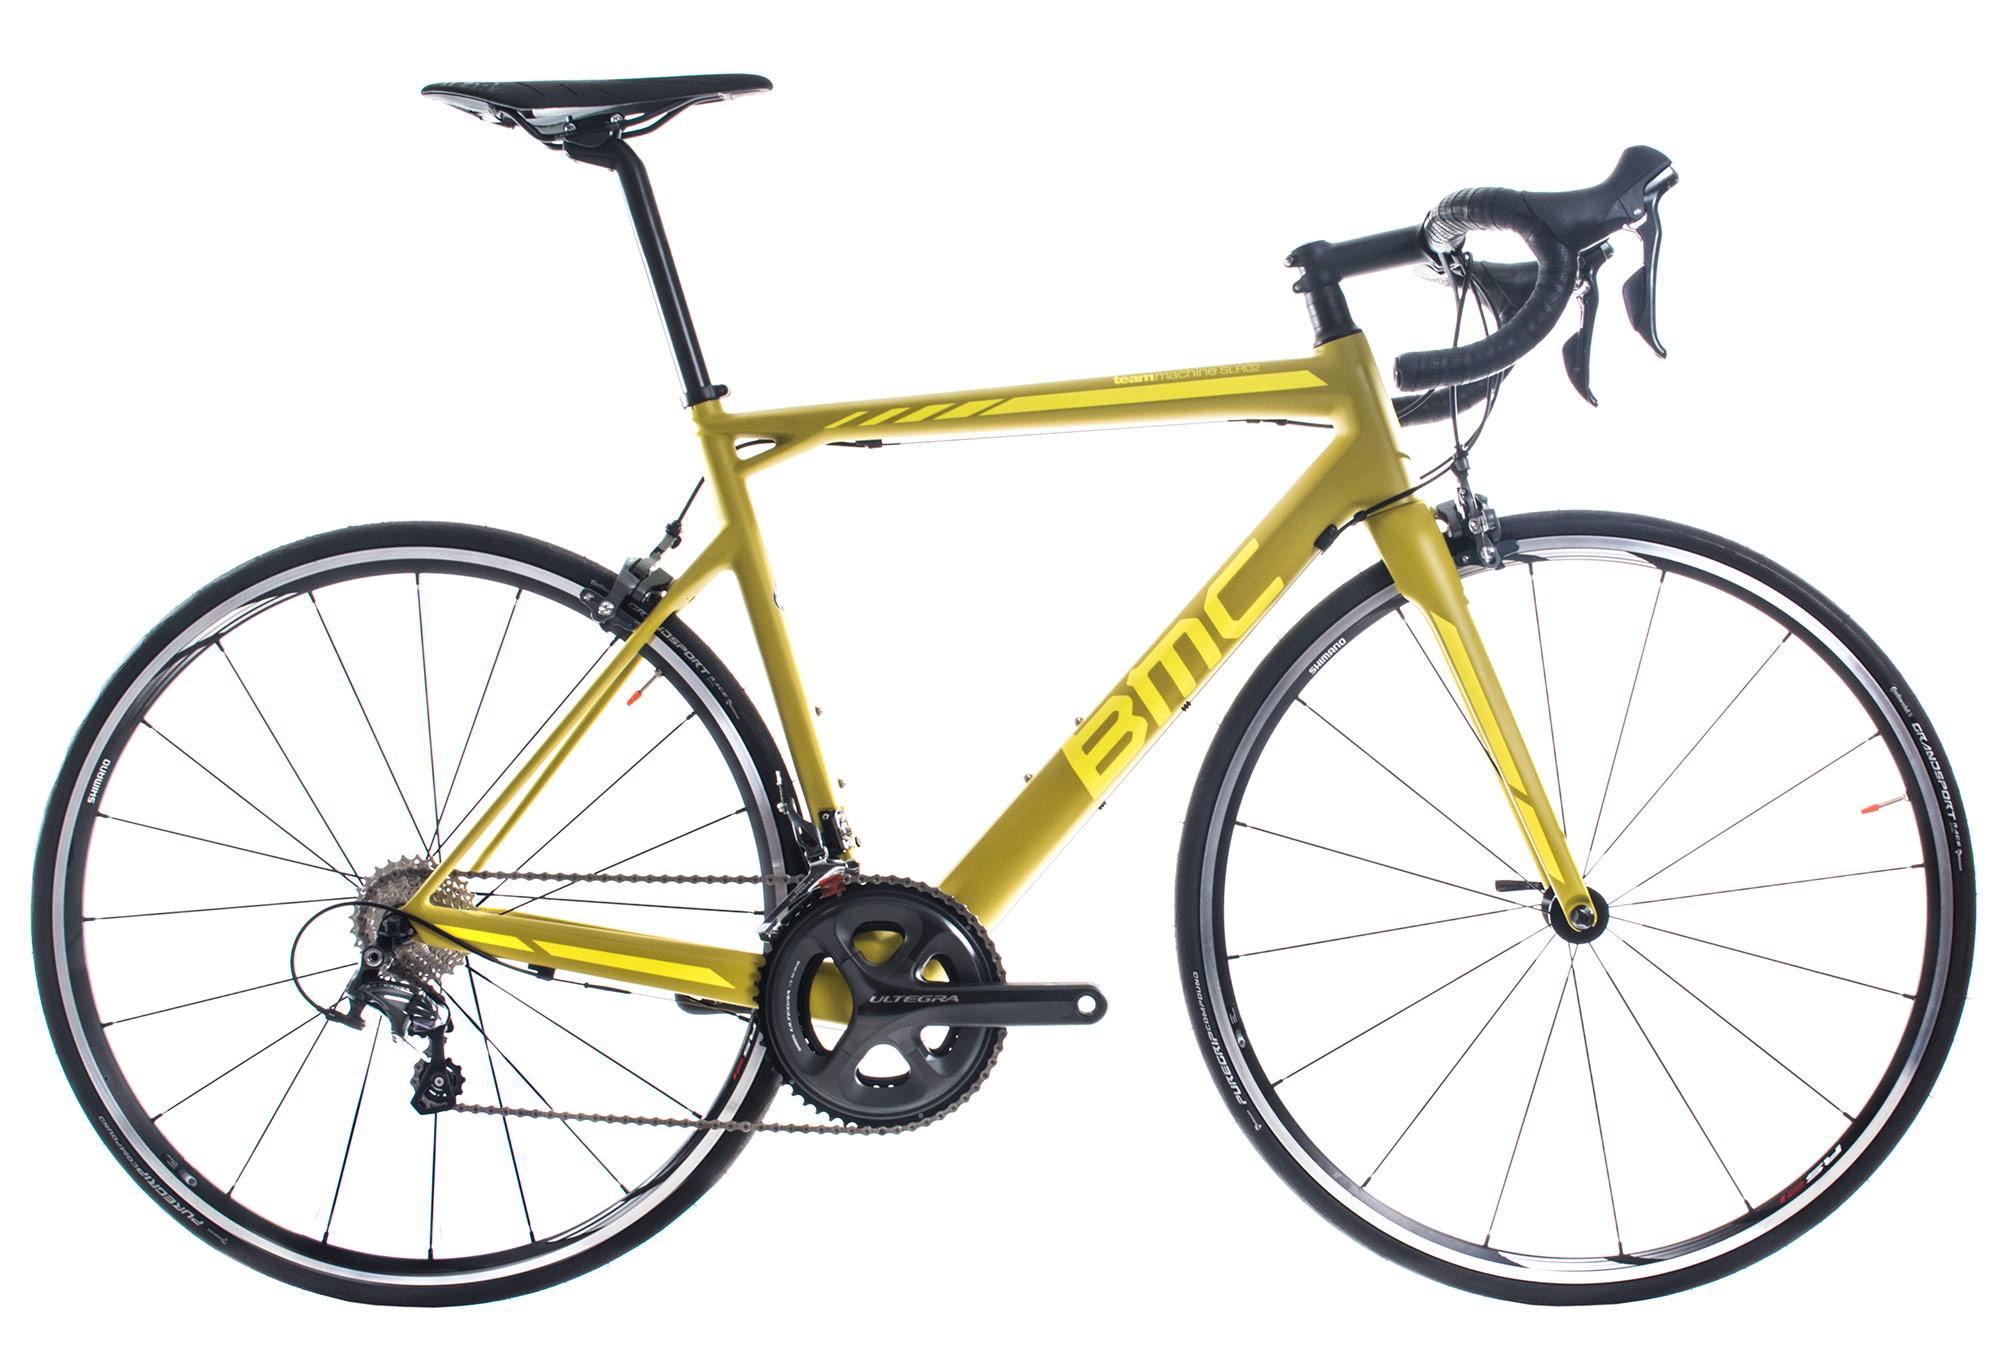 Vélo de route BMC TeamMachine SLR02 (2017) - Shimano Ultegra 11V, jaune (du 48 au 60 cm)